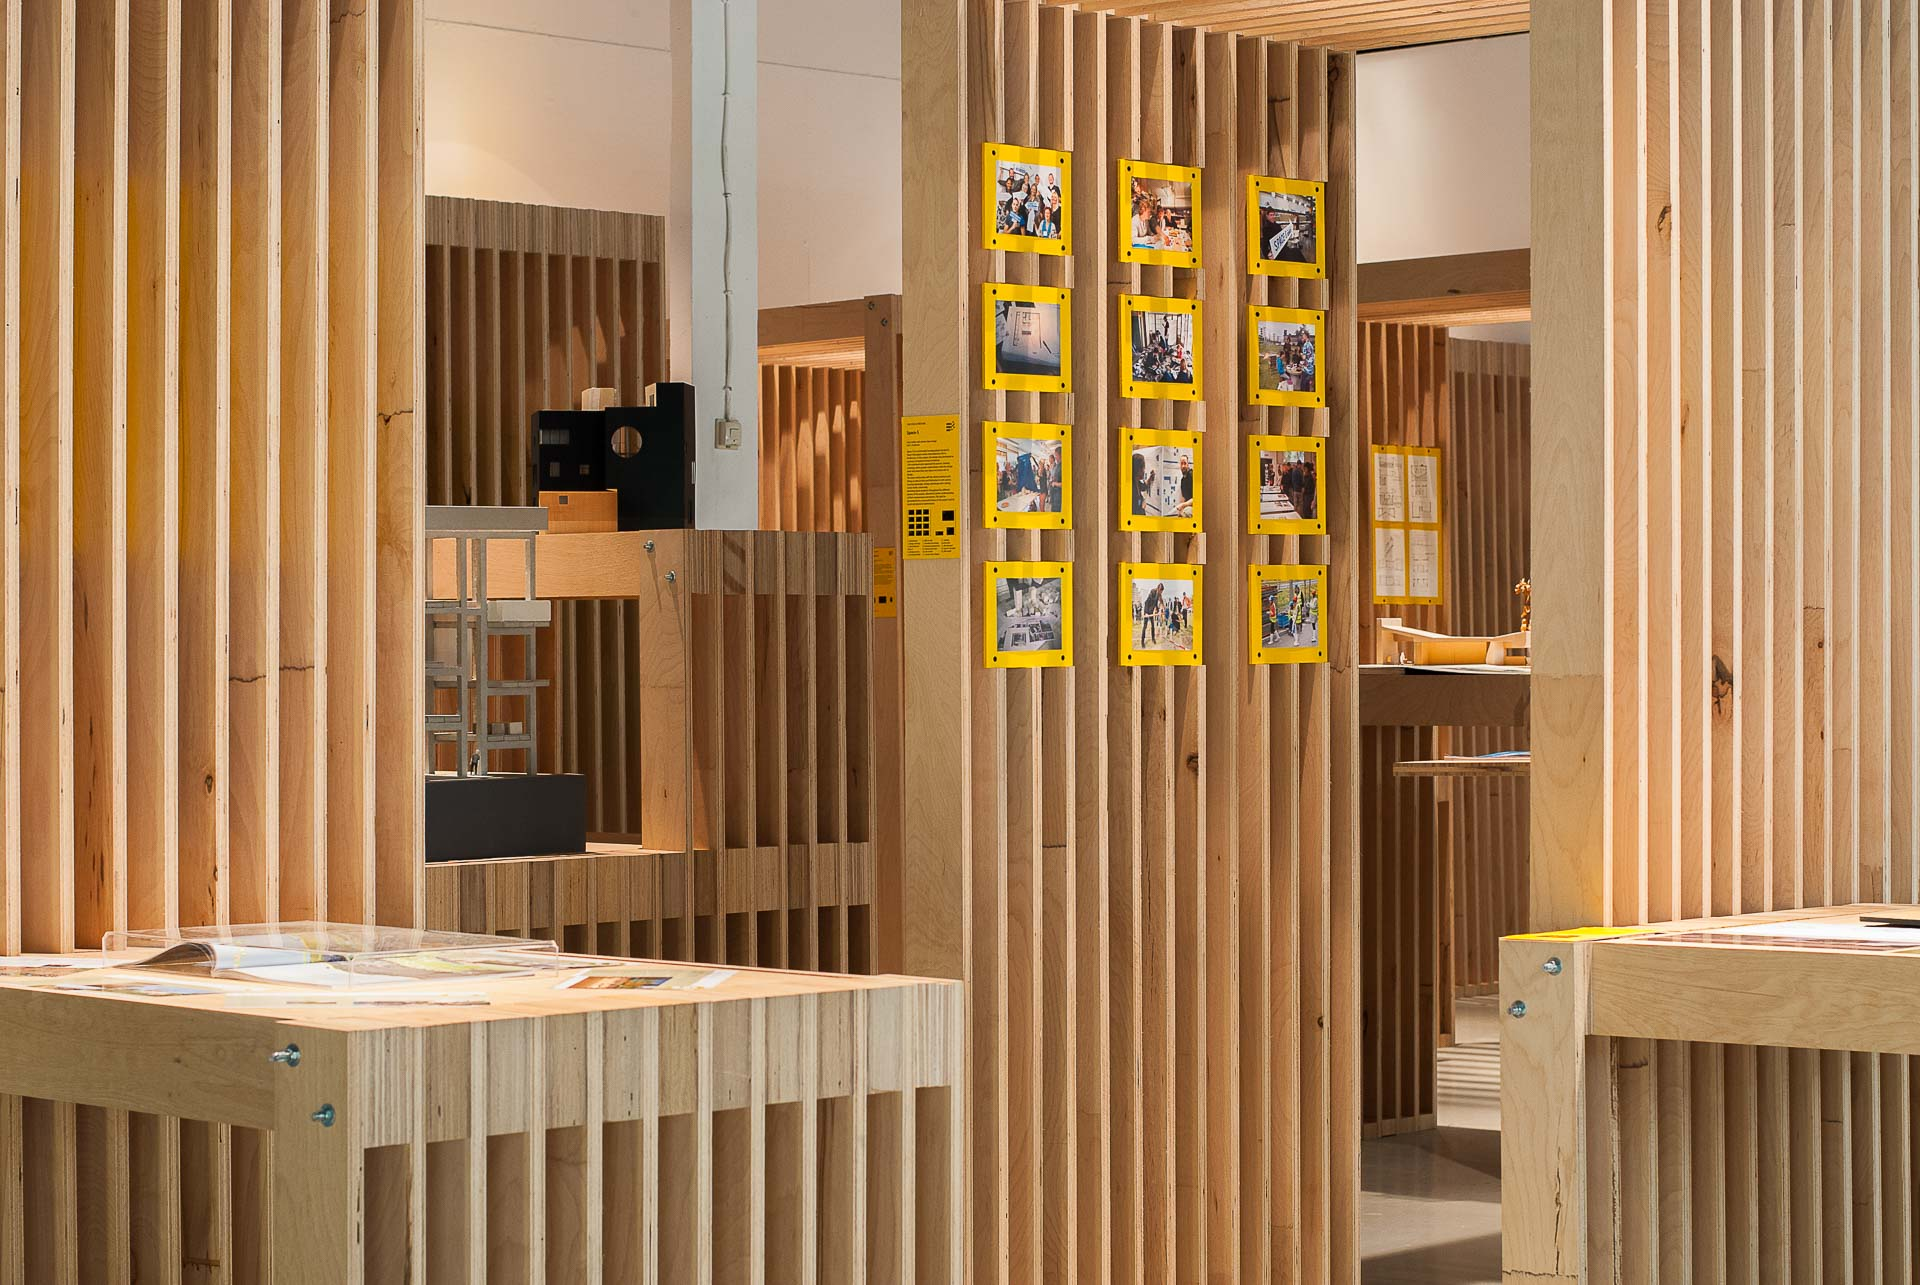 Eindhoven Eight: New Dutch Architecture and Urbanism - exhibition